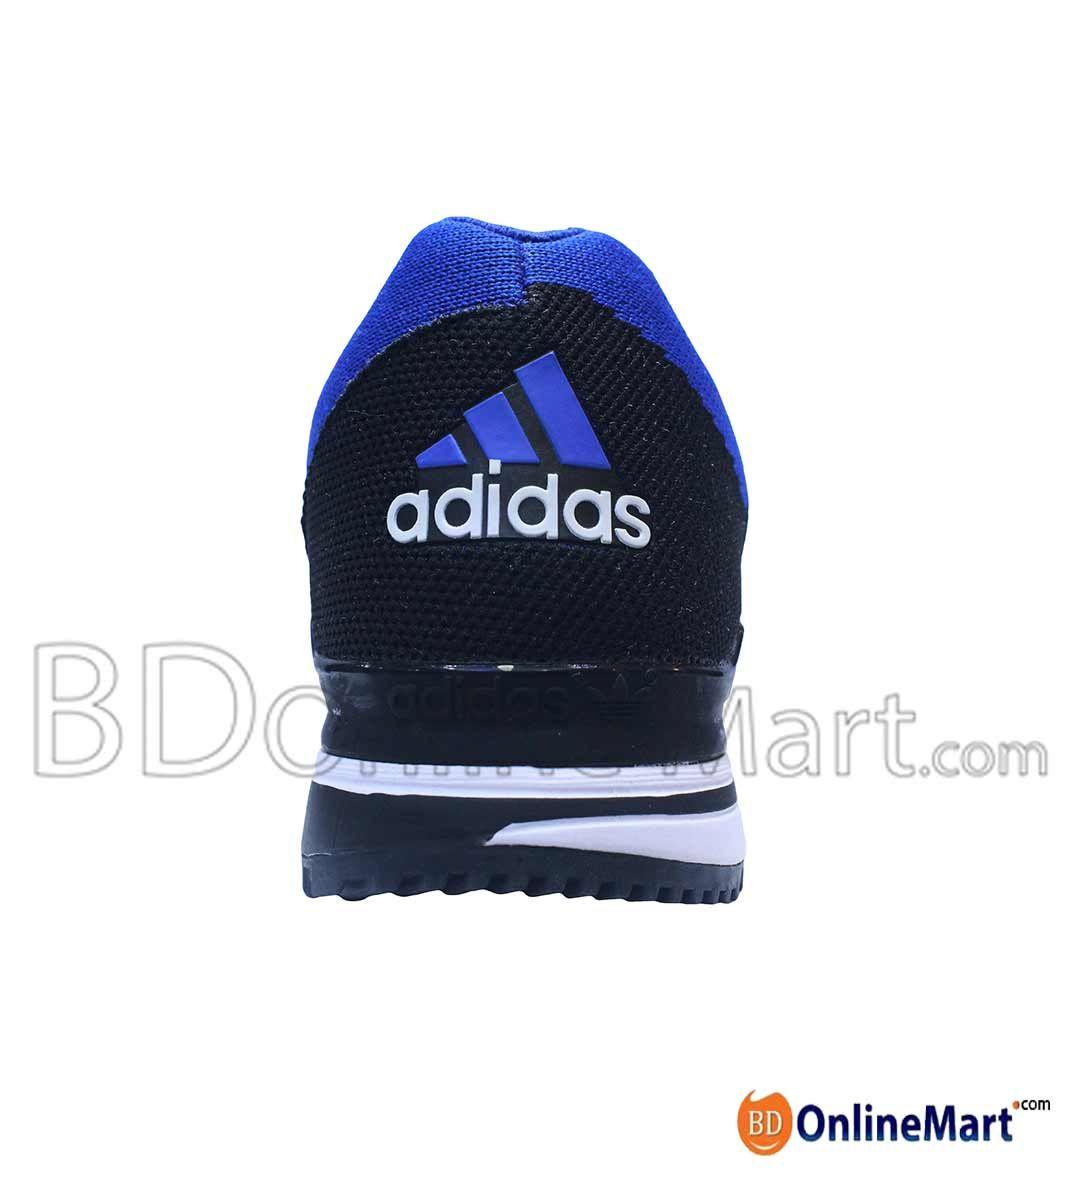 1cc7e4ebf932 Pin by BDonlinemart on adidas shoes Bangladesh | Adidas, Buy adidas ...